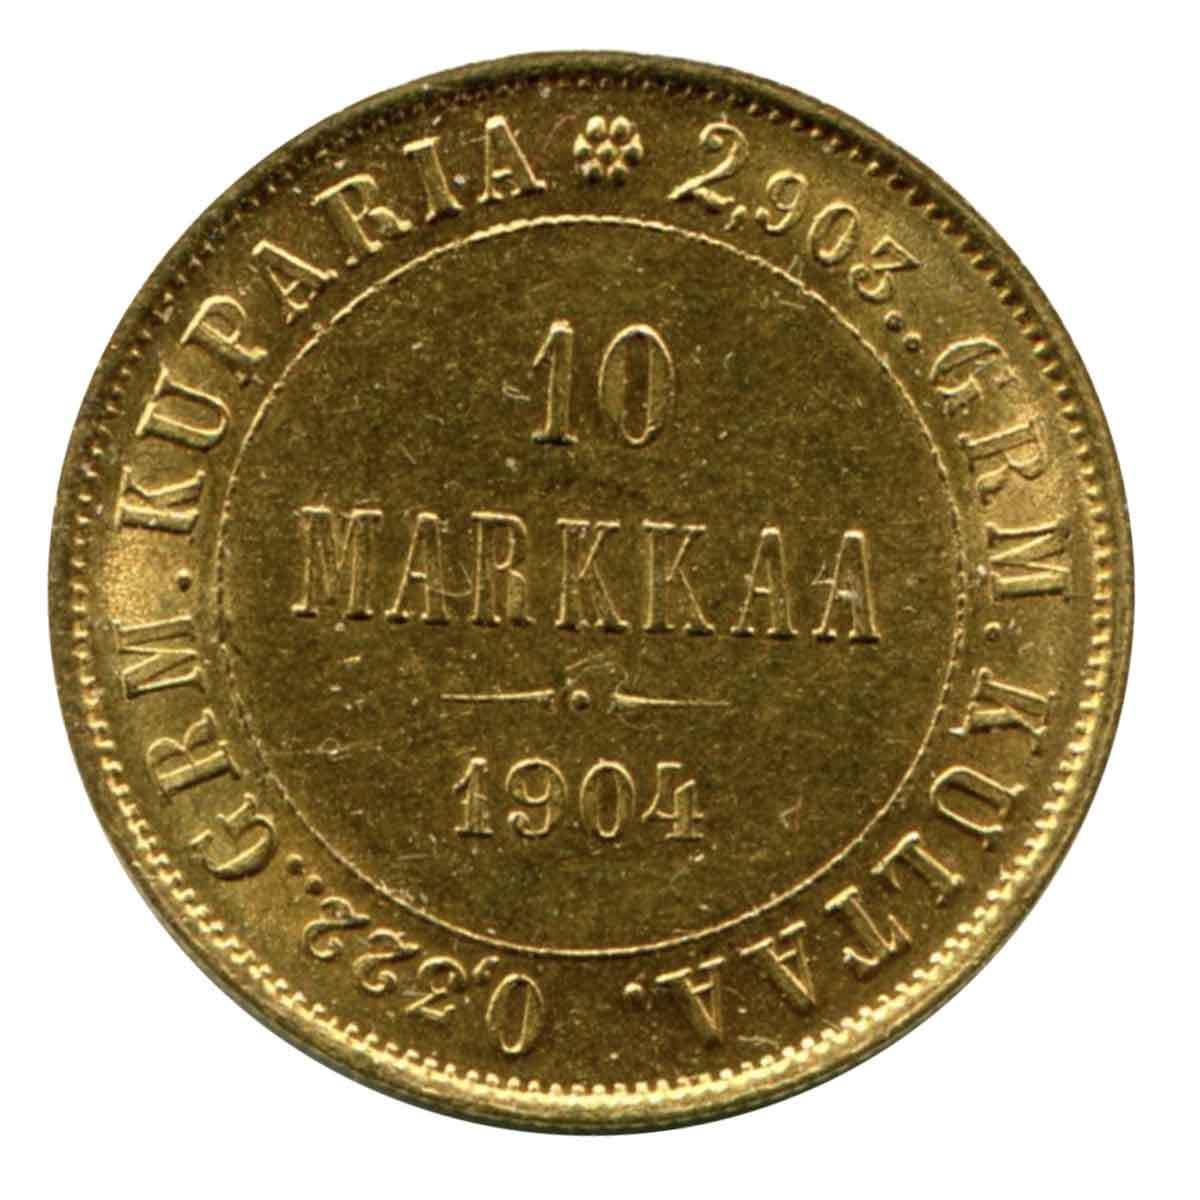 10 марок 1904 год. Золото